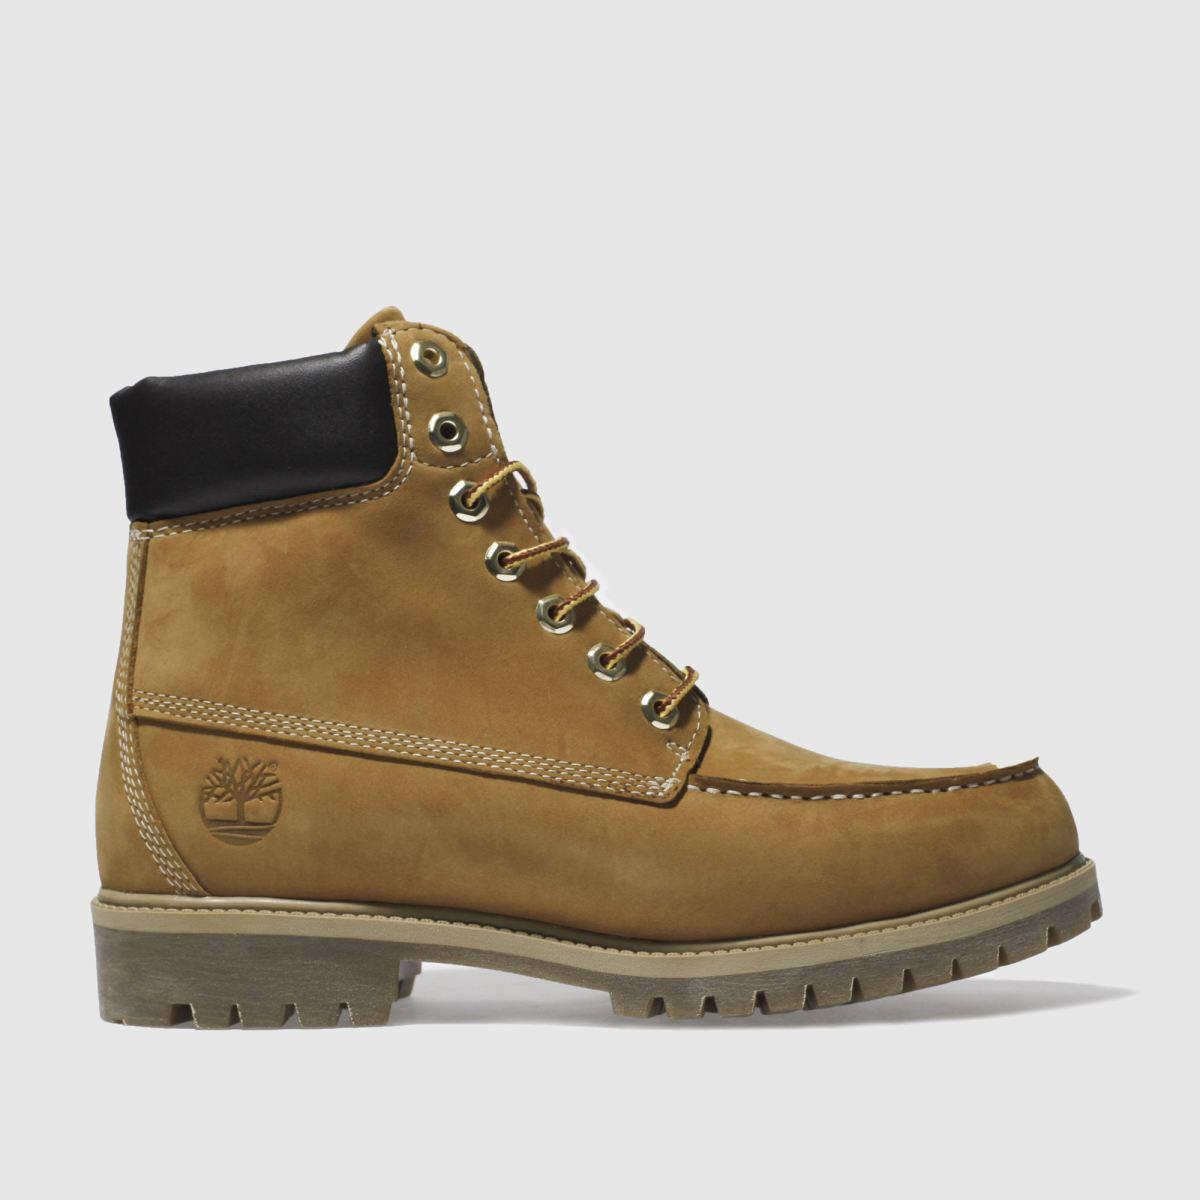 Timberland Natural 6 Inch Premium Moc Toe Boots